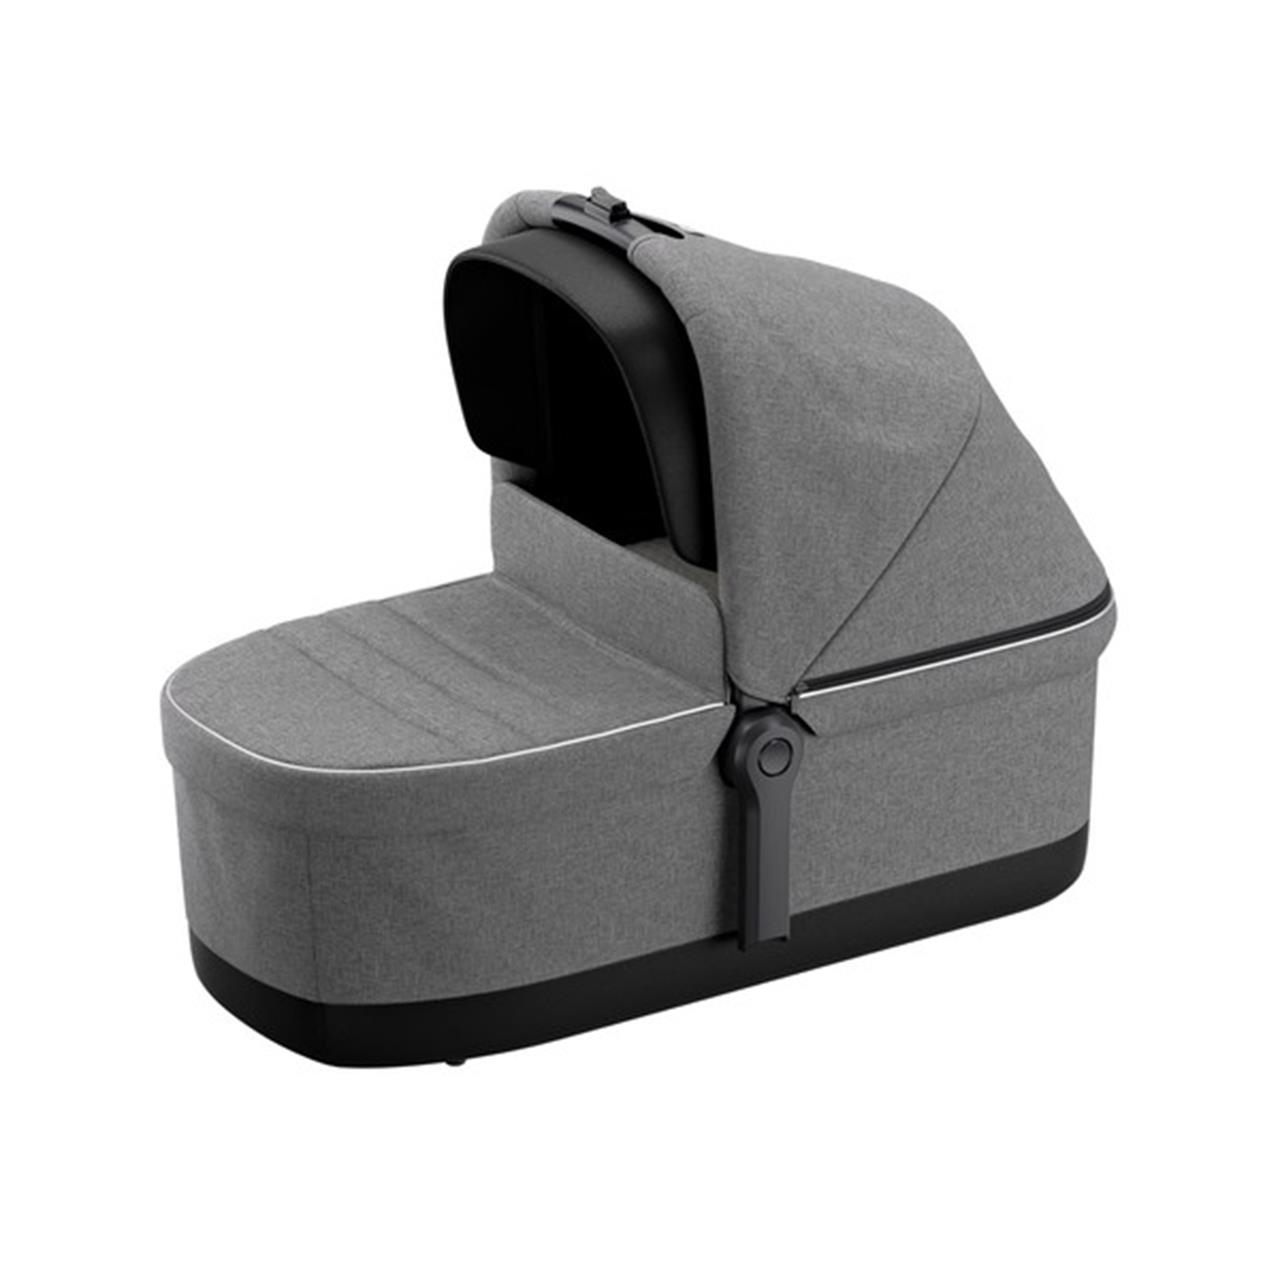 Accesoriu Thule Sleek Bassinet - Landou pentru Thule Sleek Grey Melange imagine